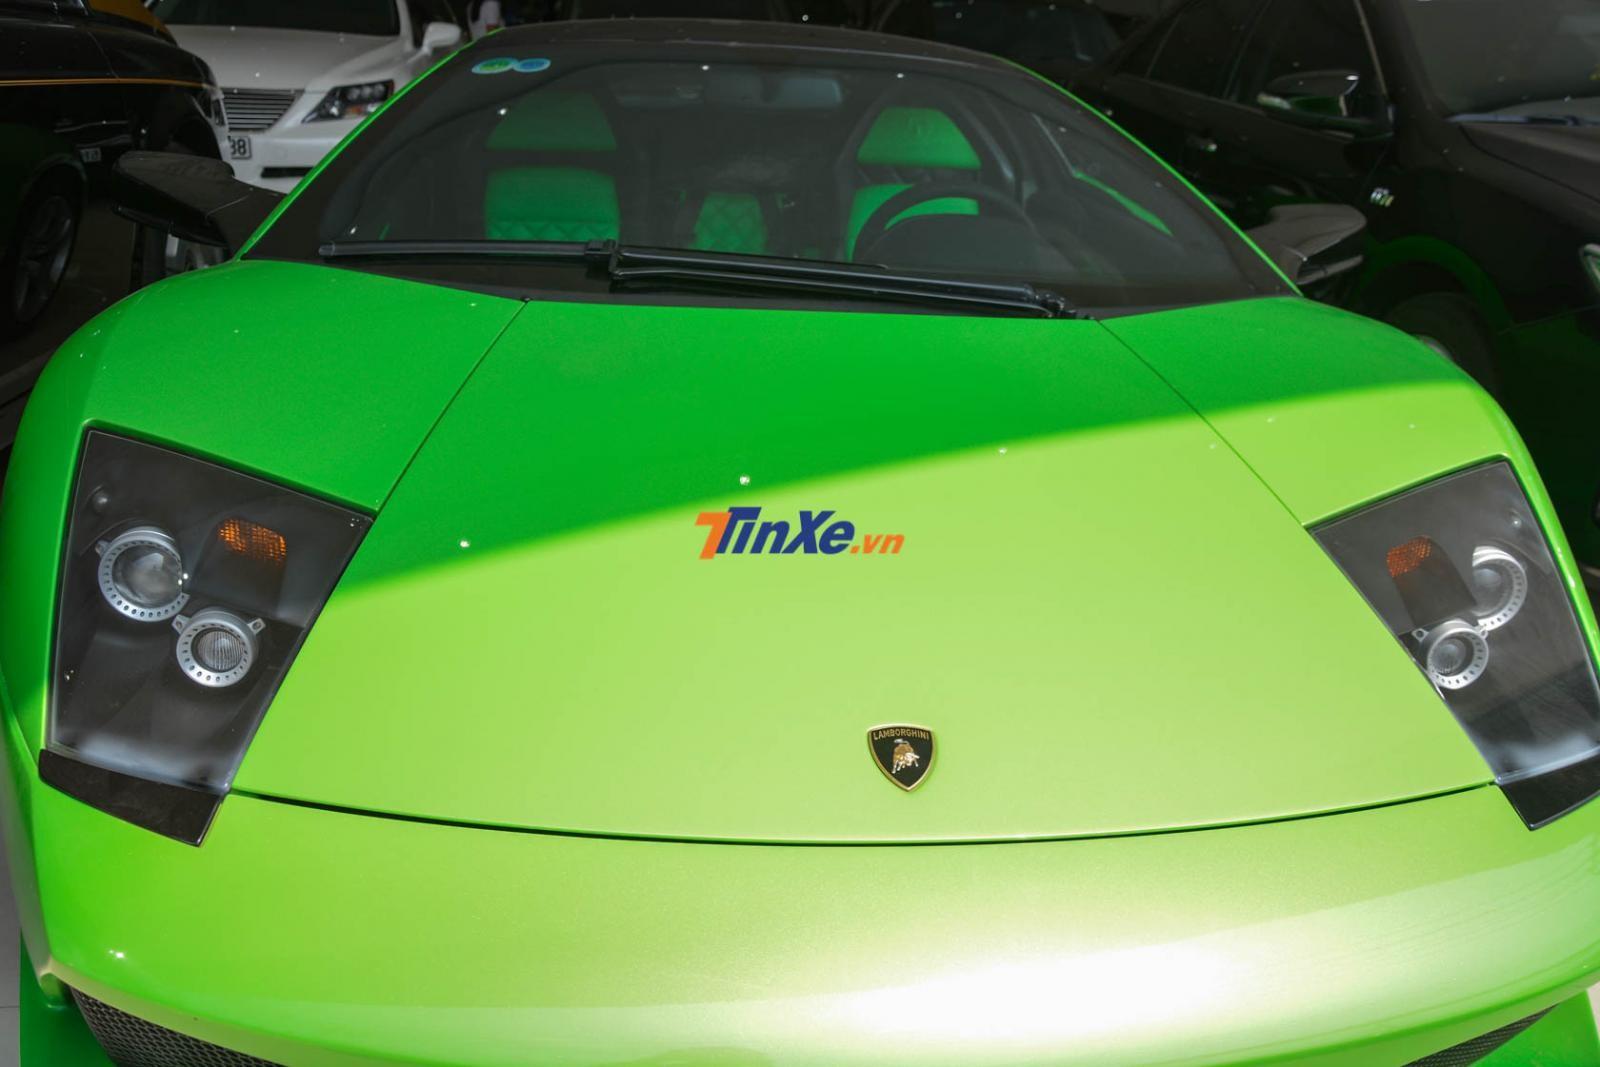 Đèn pha góc cạnh trên Lamborghini Murcielago LP640